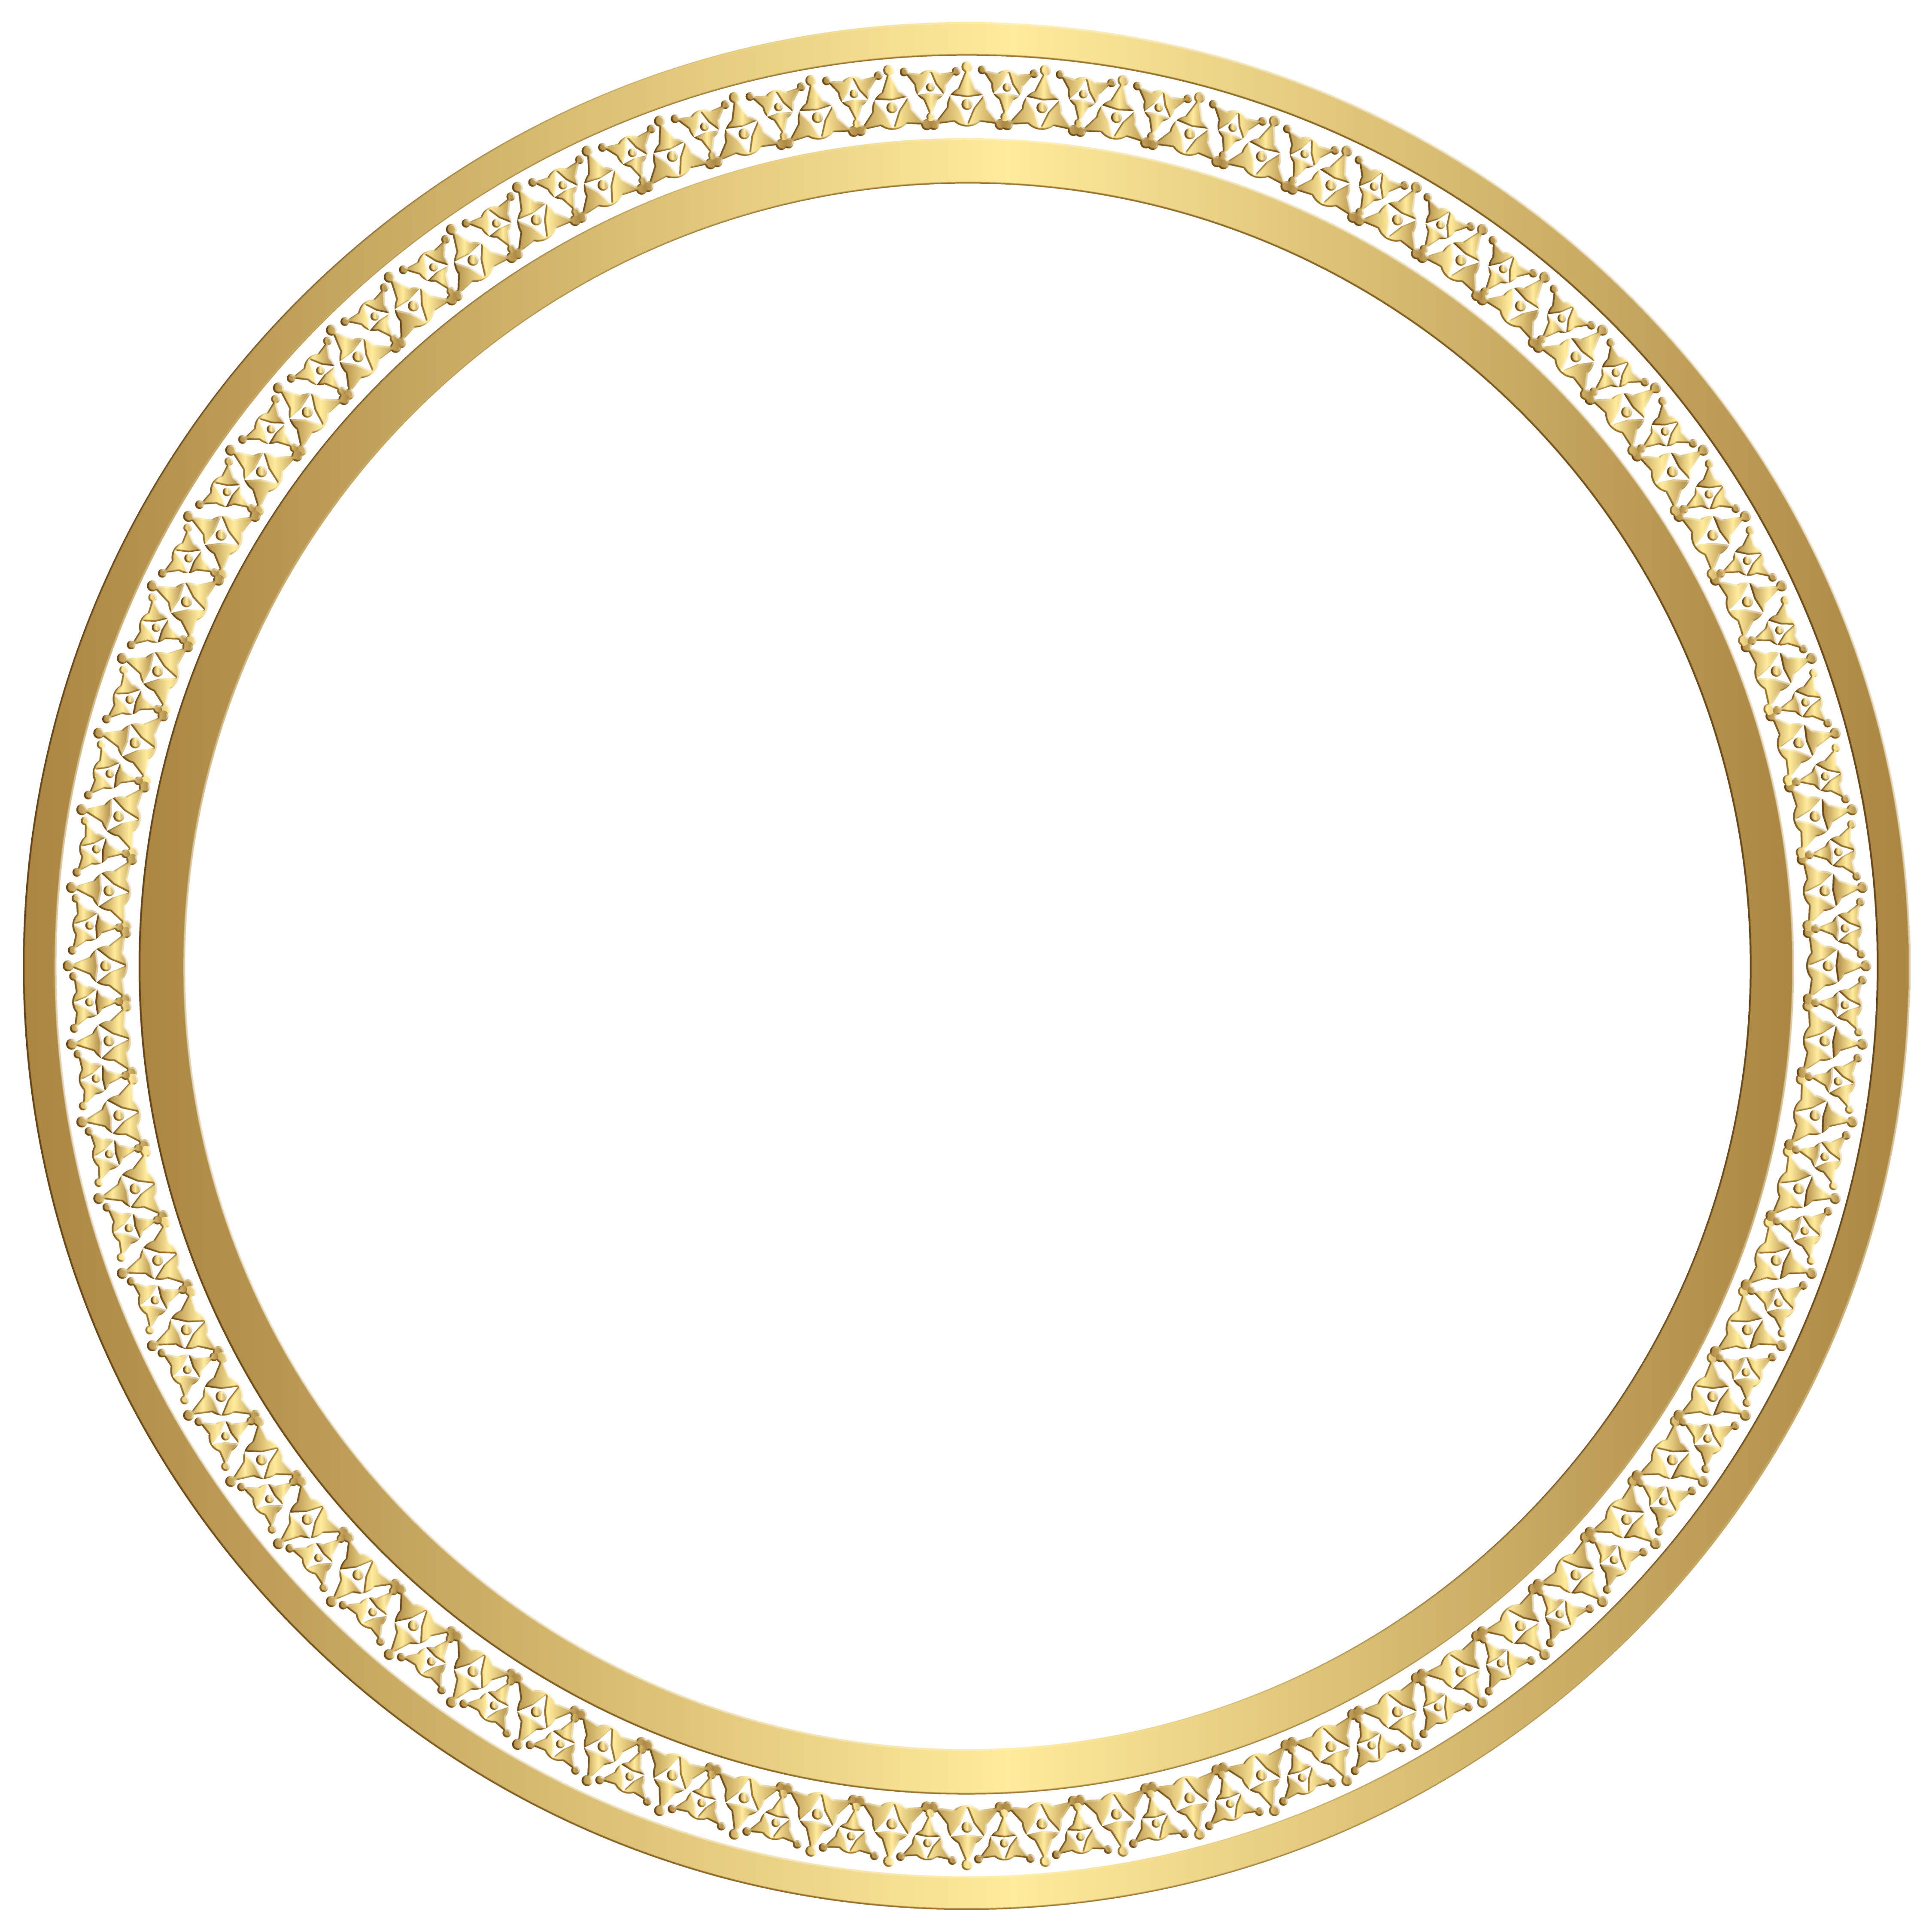 Kerek Arany Keret Keret Png Clip Art Yopriceville Galeria Kivalo Minosegu Kepek Es Atlatszo Png Szabad Clipart Gold Circle Frames Gold Border Clip Art